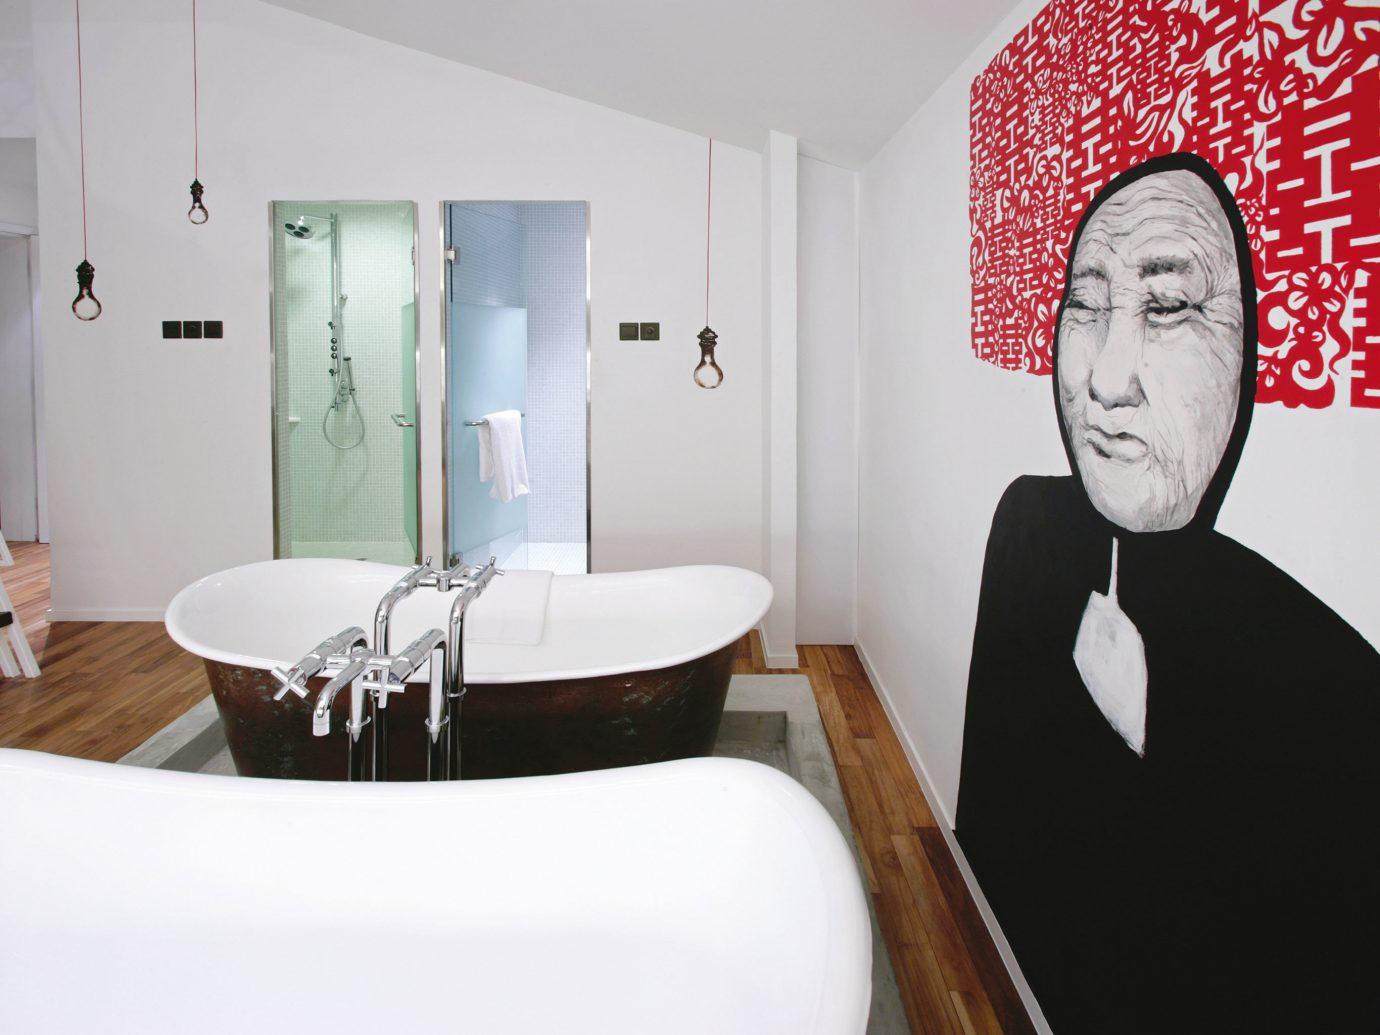 Bath Hotels Luxury Modern wall indoor person room interior design Design